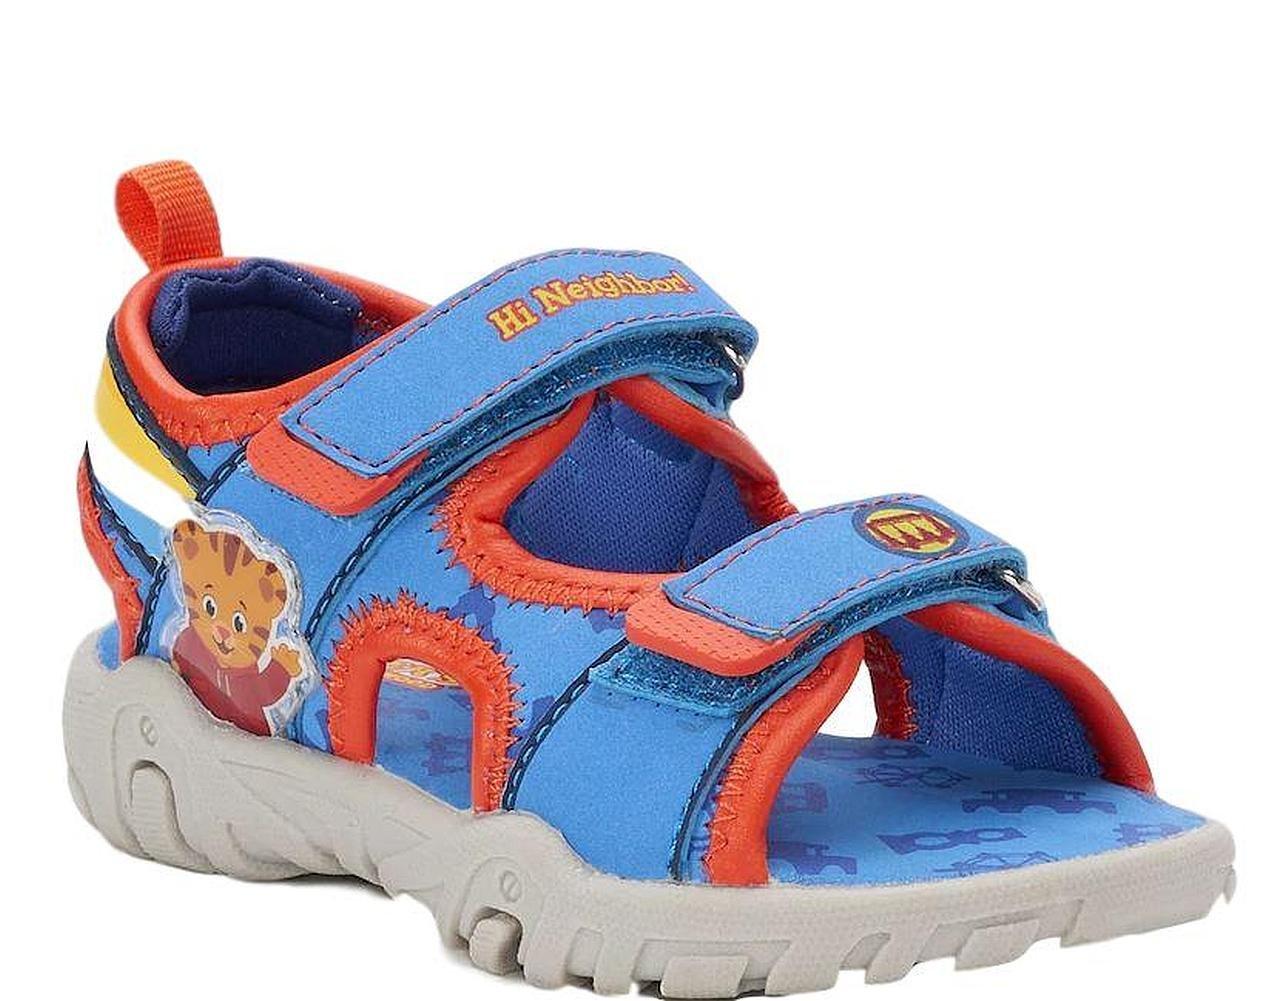 Daniel Tiger Neighborhood Sandal Flip Flop for Toddler Boys Summer Shoe (5 Medium)